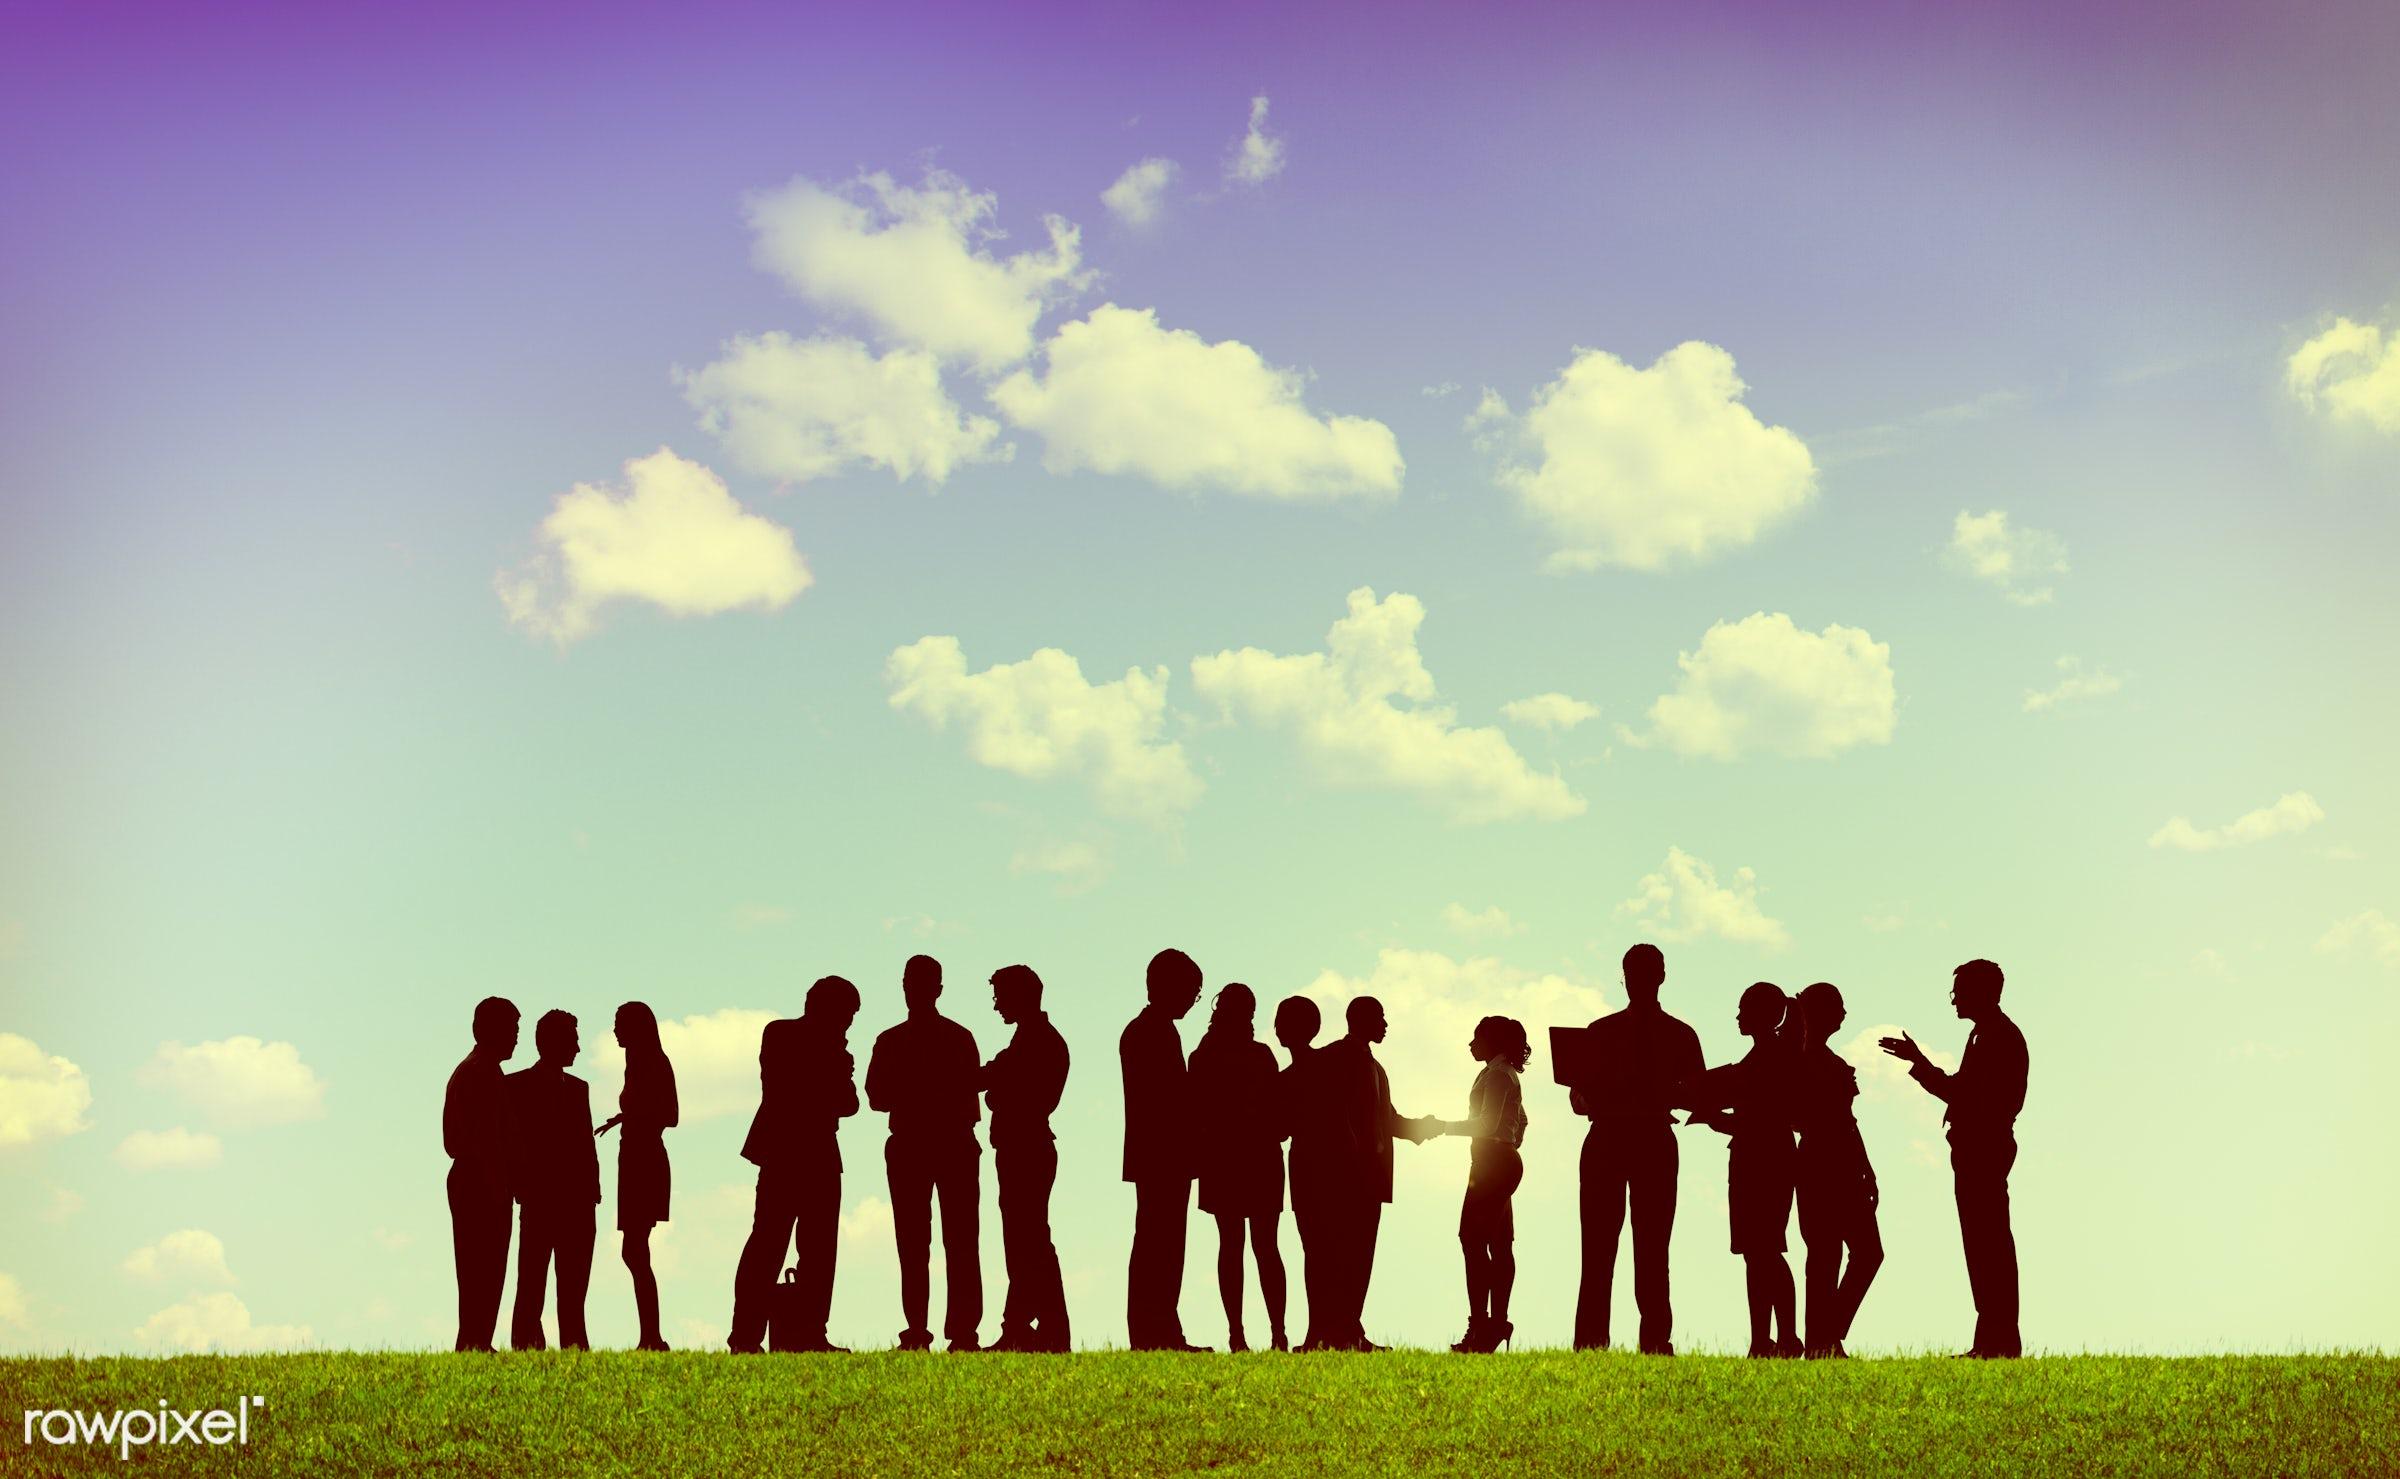 aspiration, brainstorming, business, business people, businessmen, businesswomen, cloud, cloudscape, collaboration,...